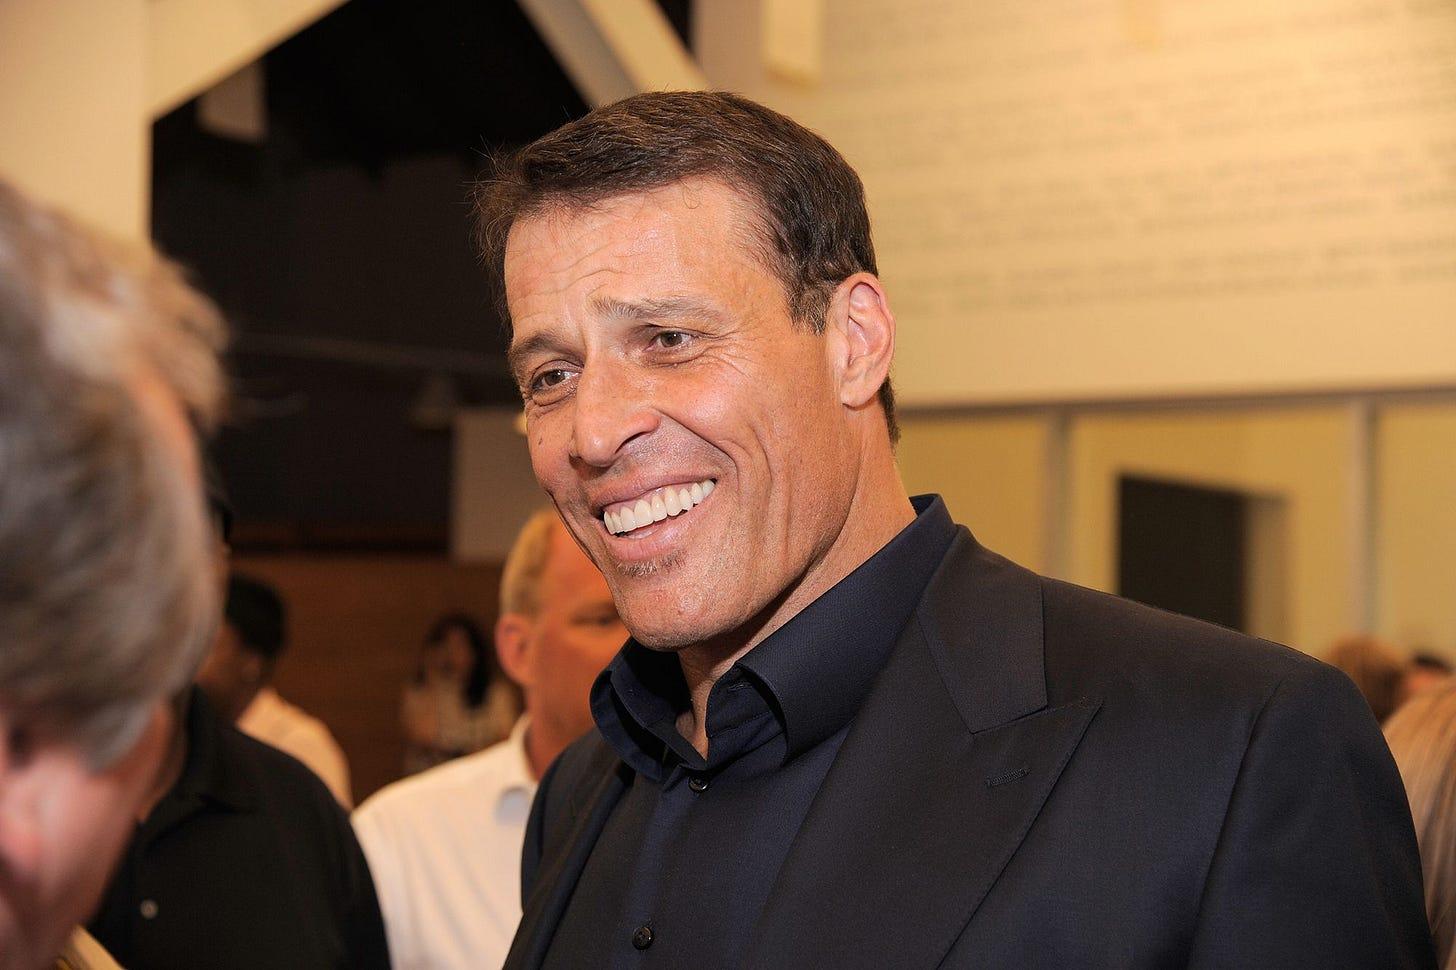 Tony Robbins accused of berating rape victims, misconduct